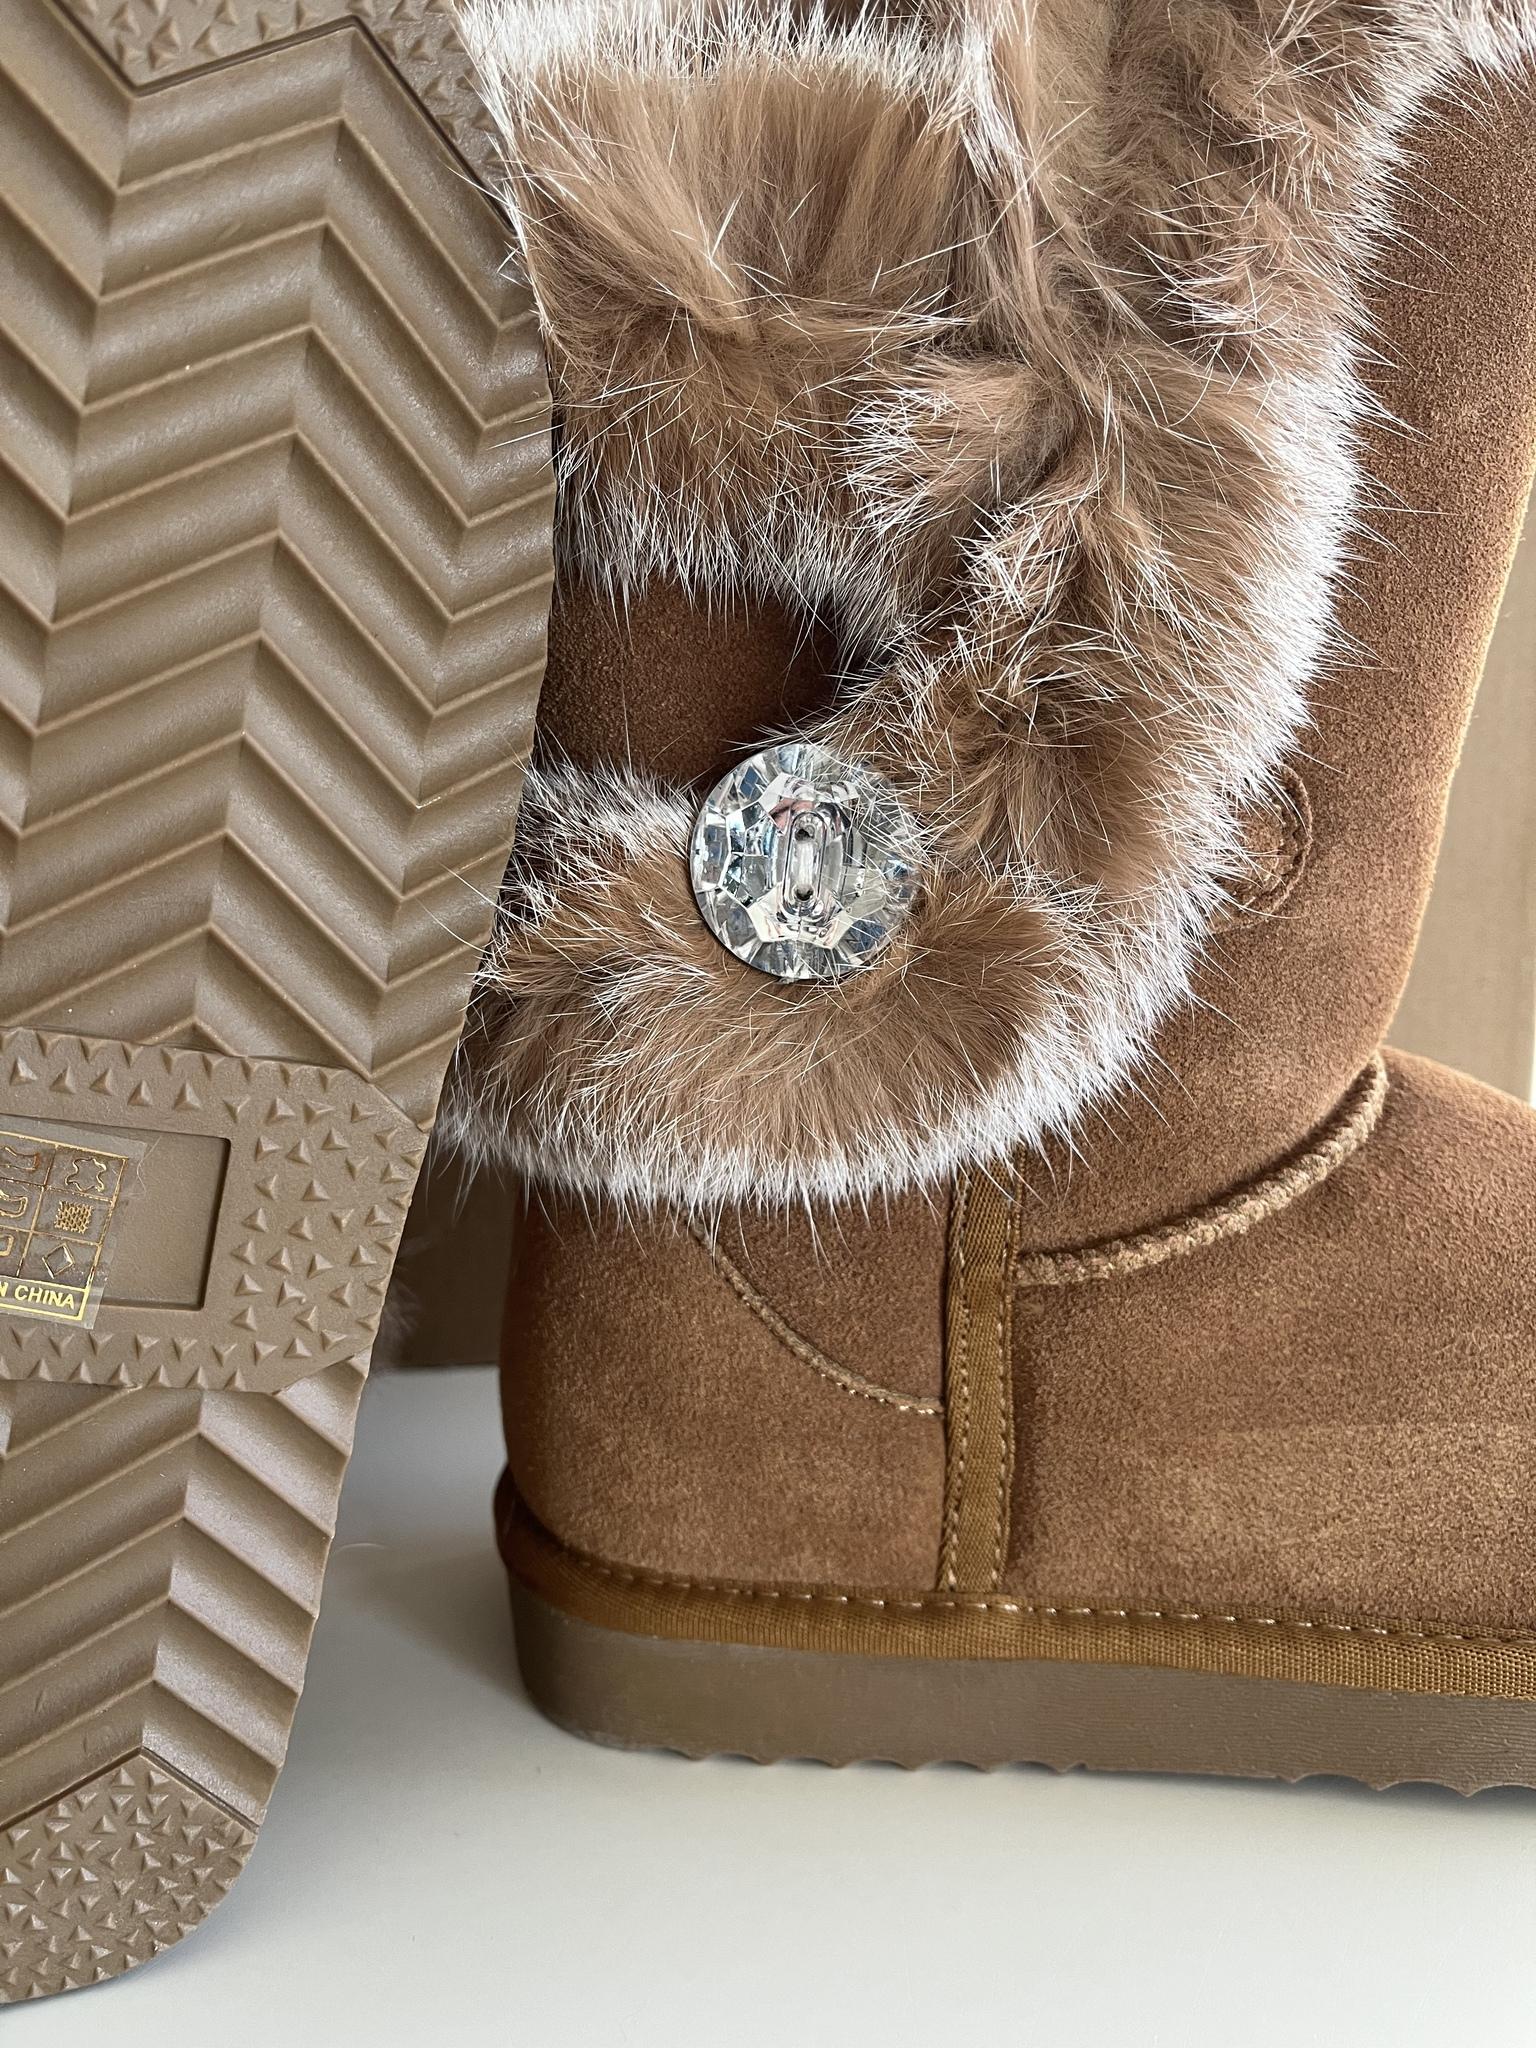 Luxury original fur & mocca boot!